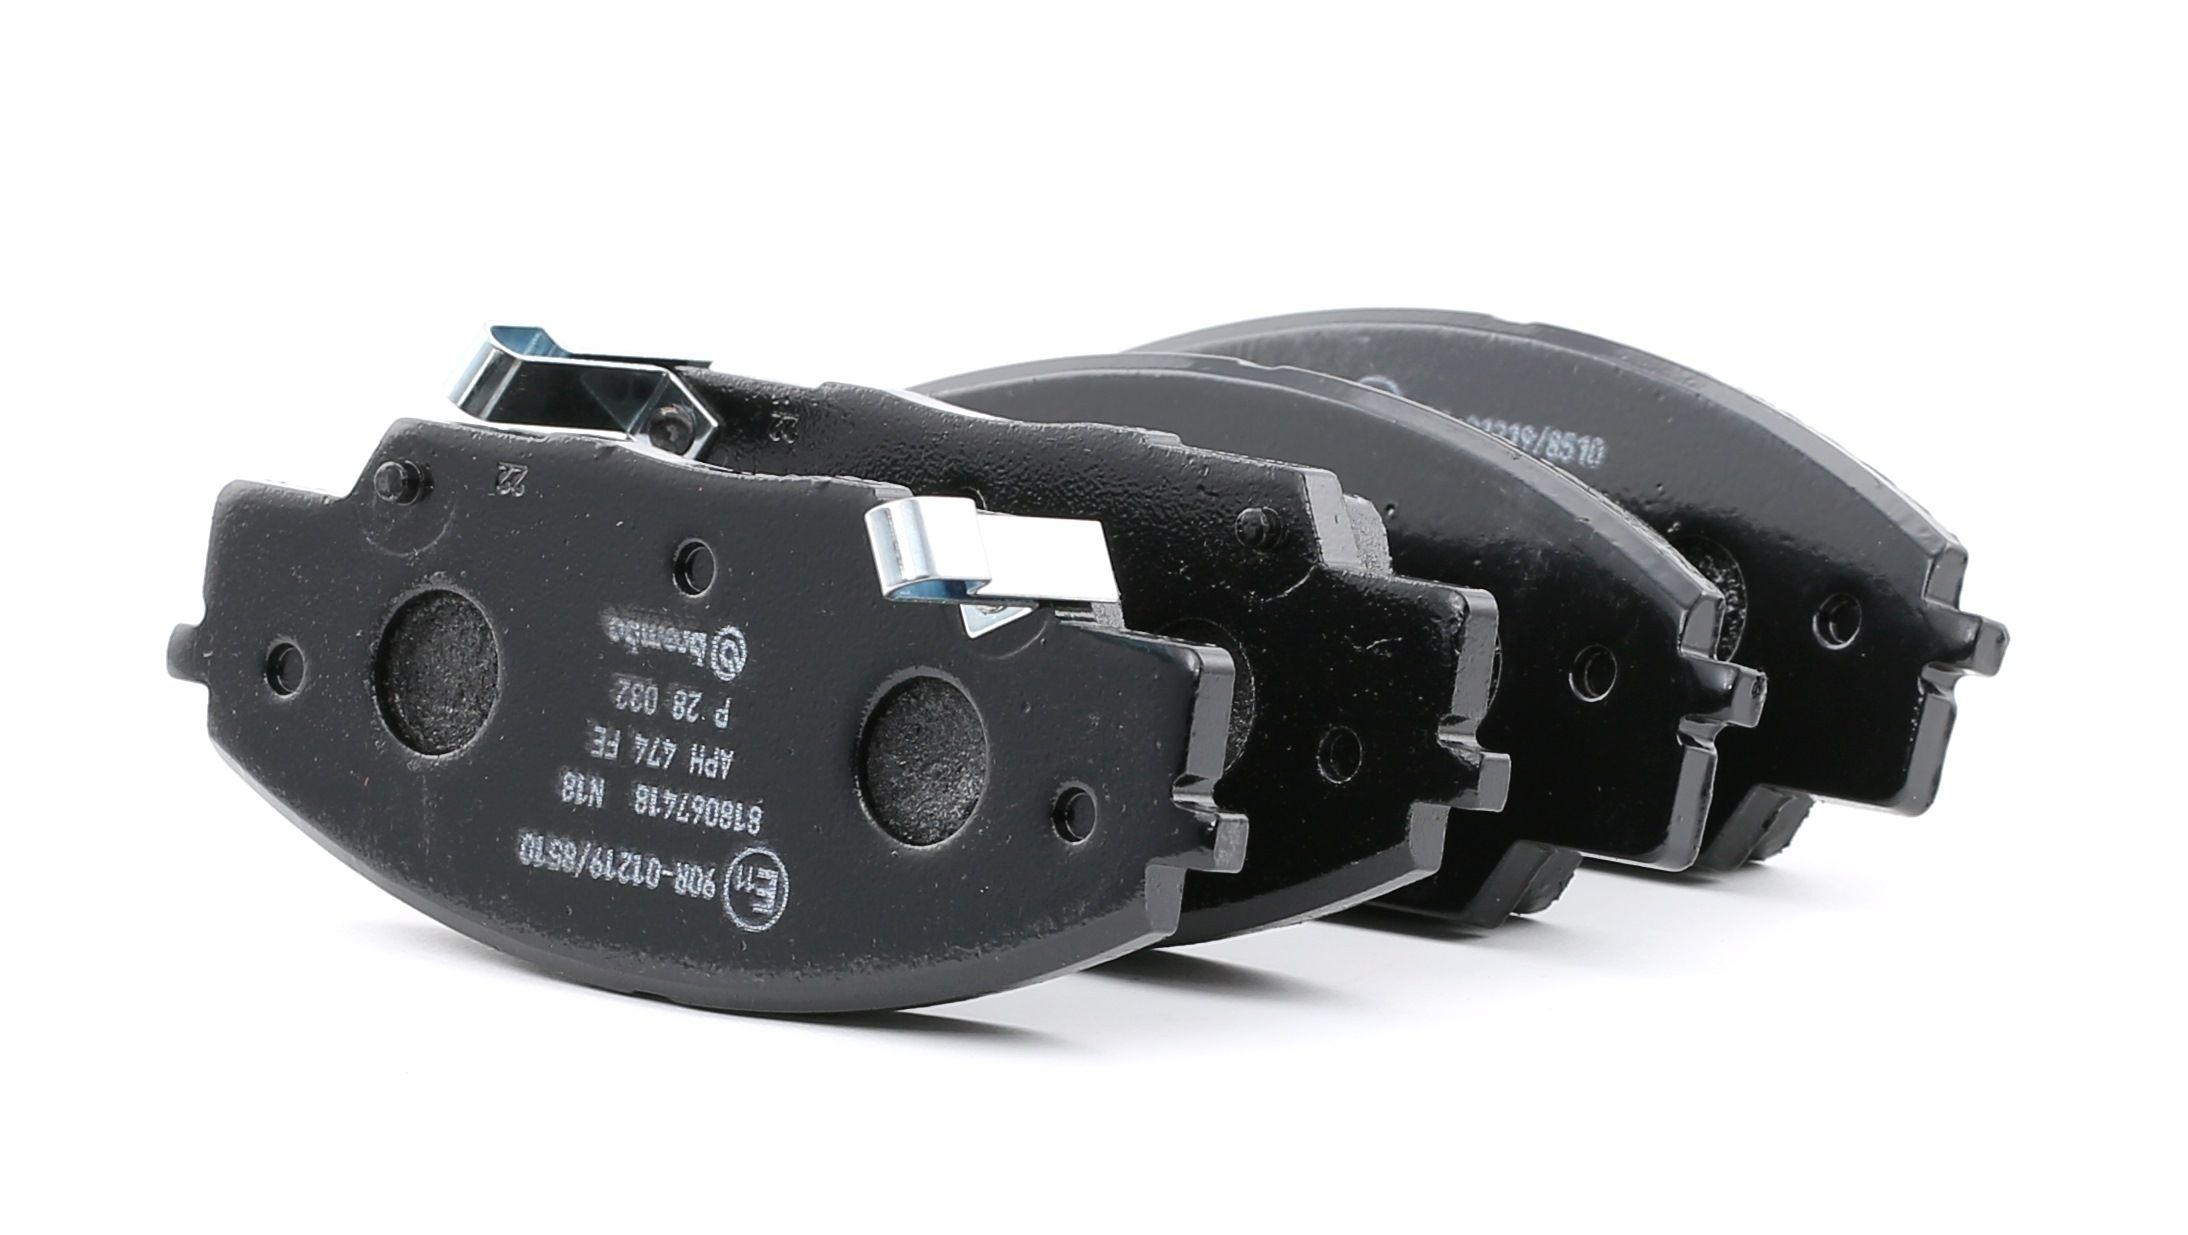 Disk brake pads BREMBO D8297702 rating